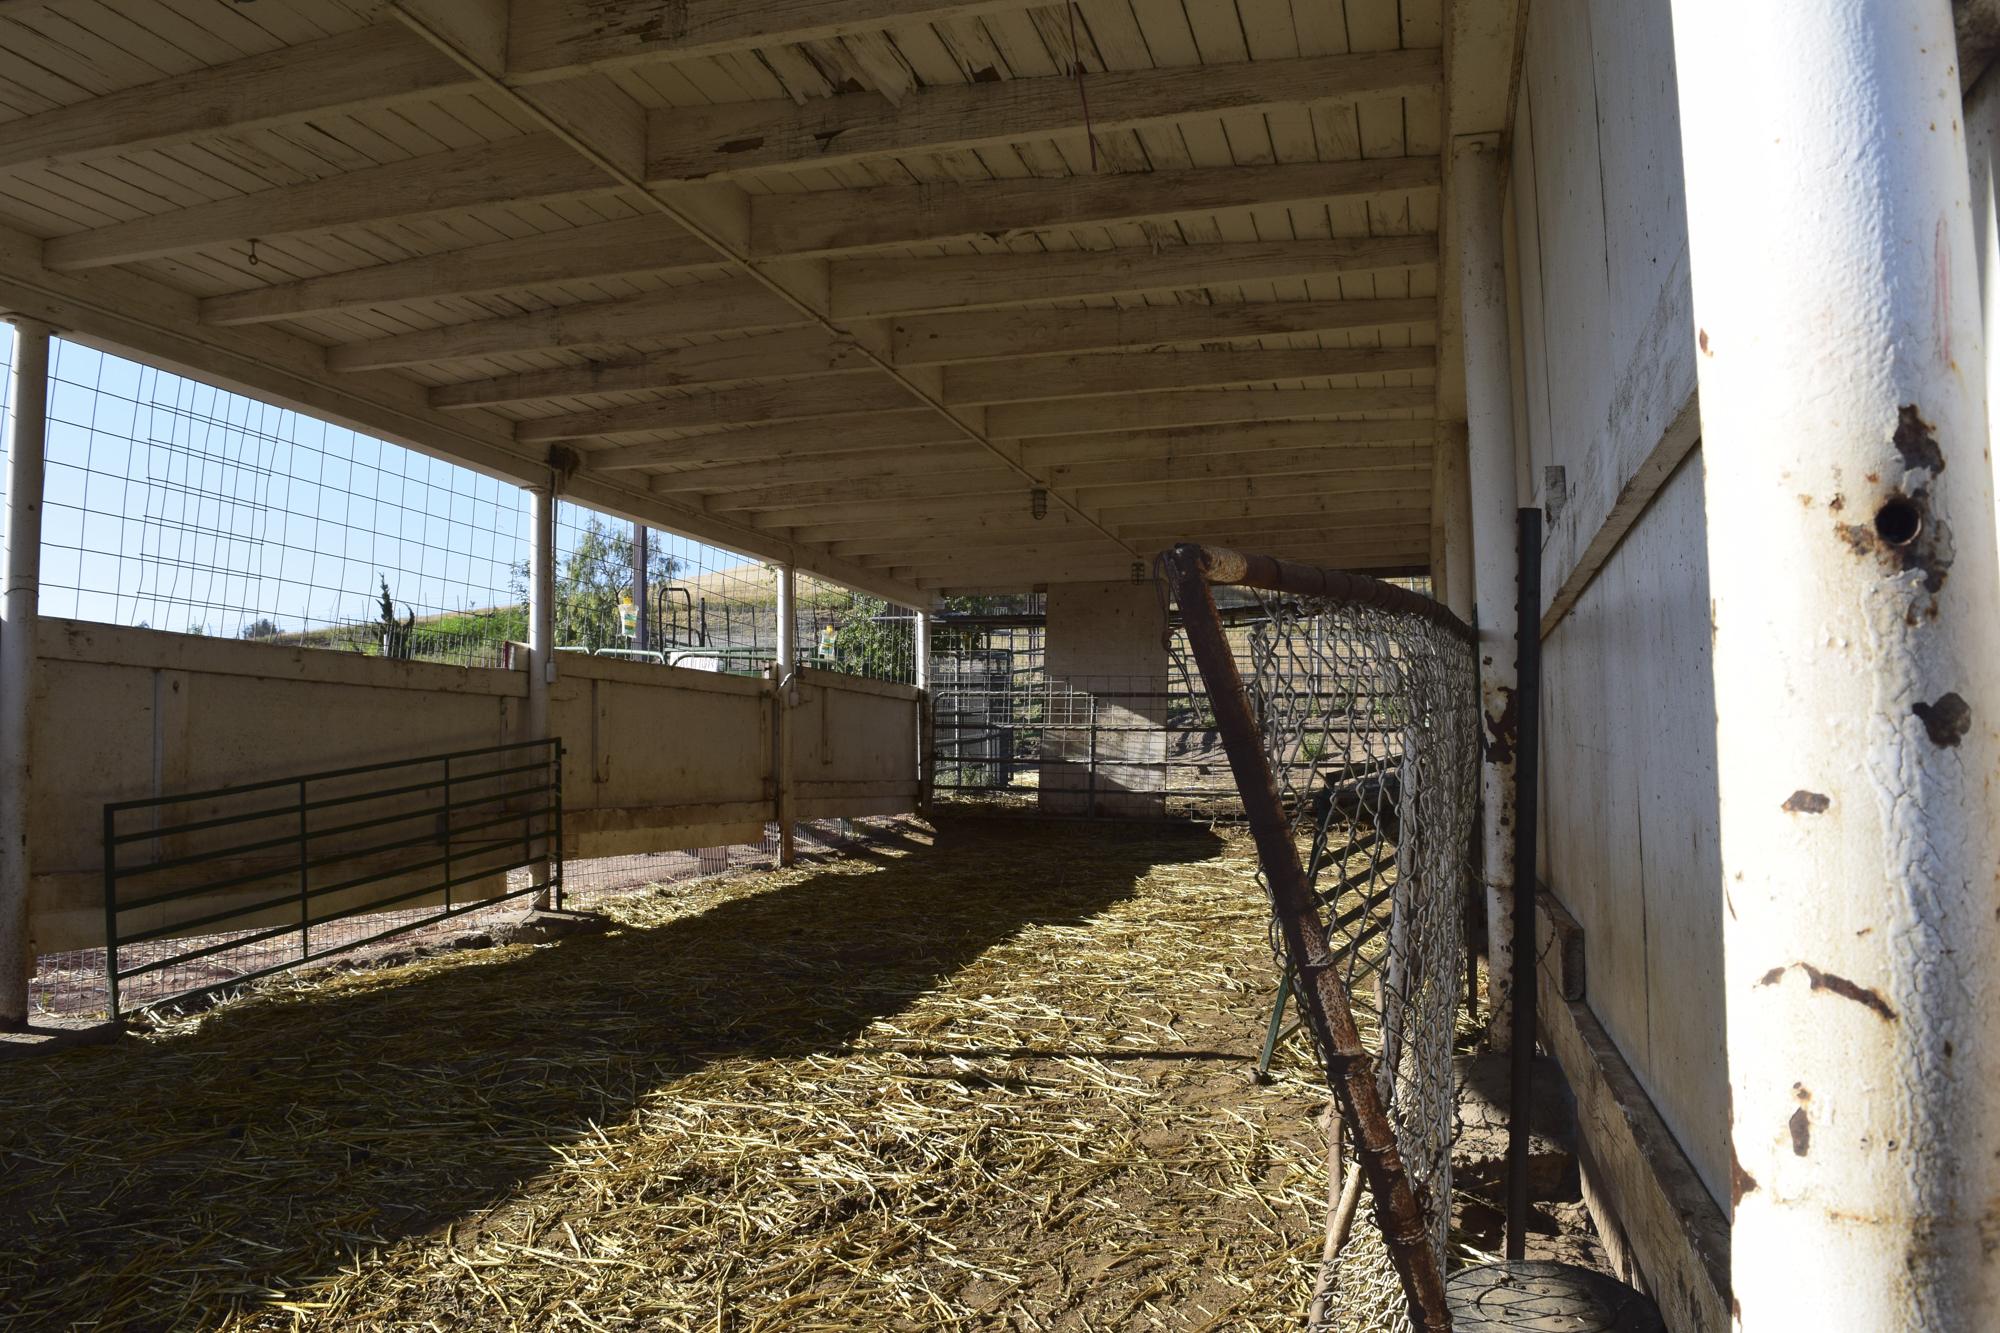 Newborn lamb stolen from barn